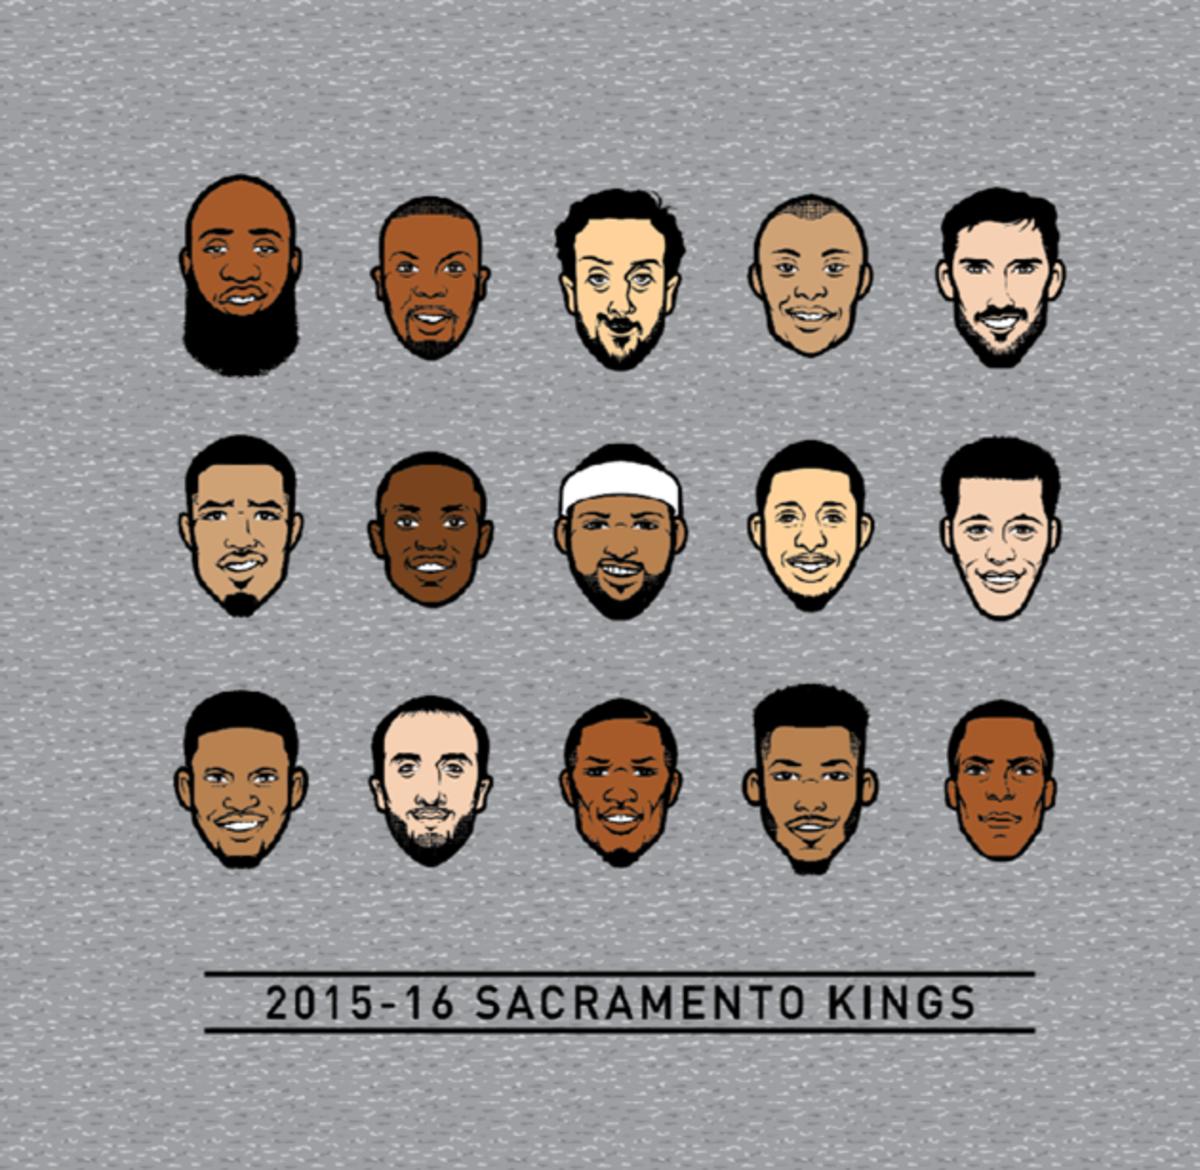 kingsshirts.png